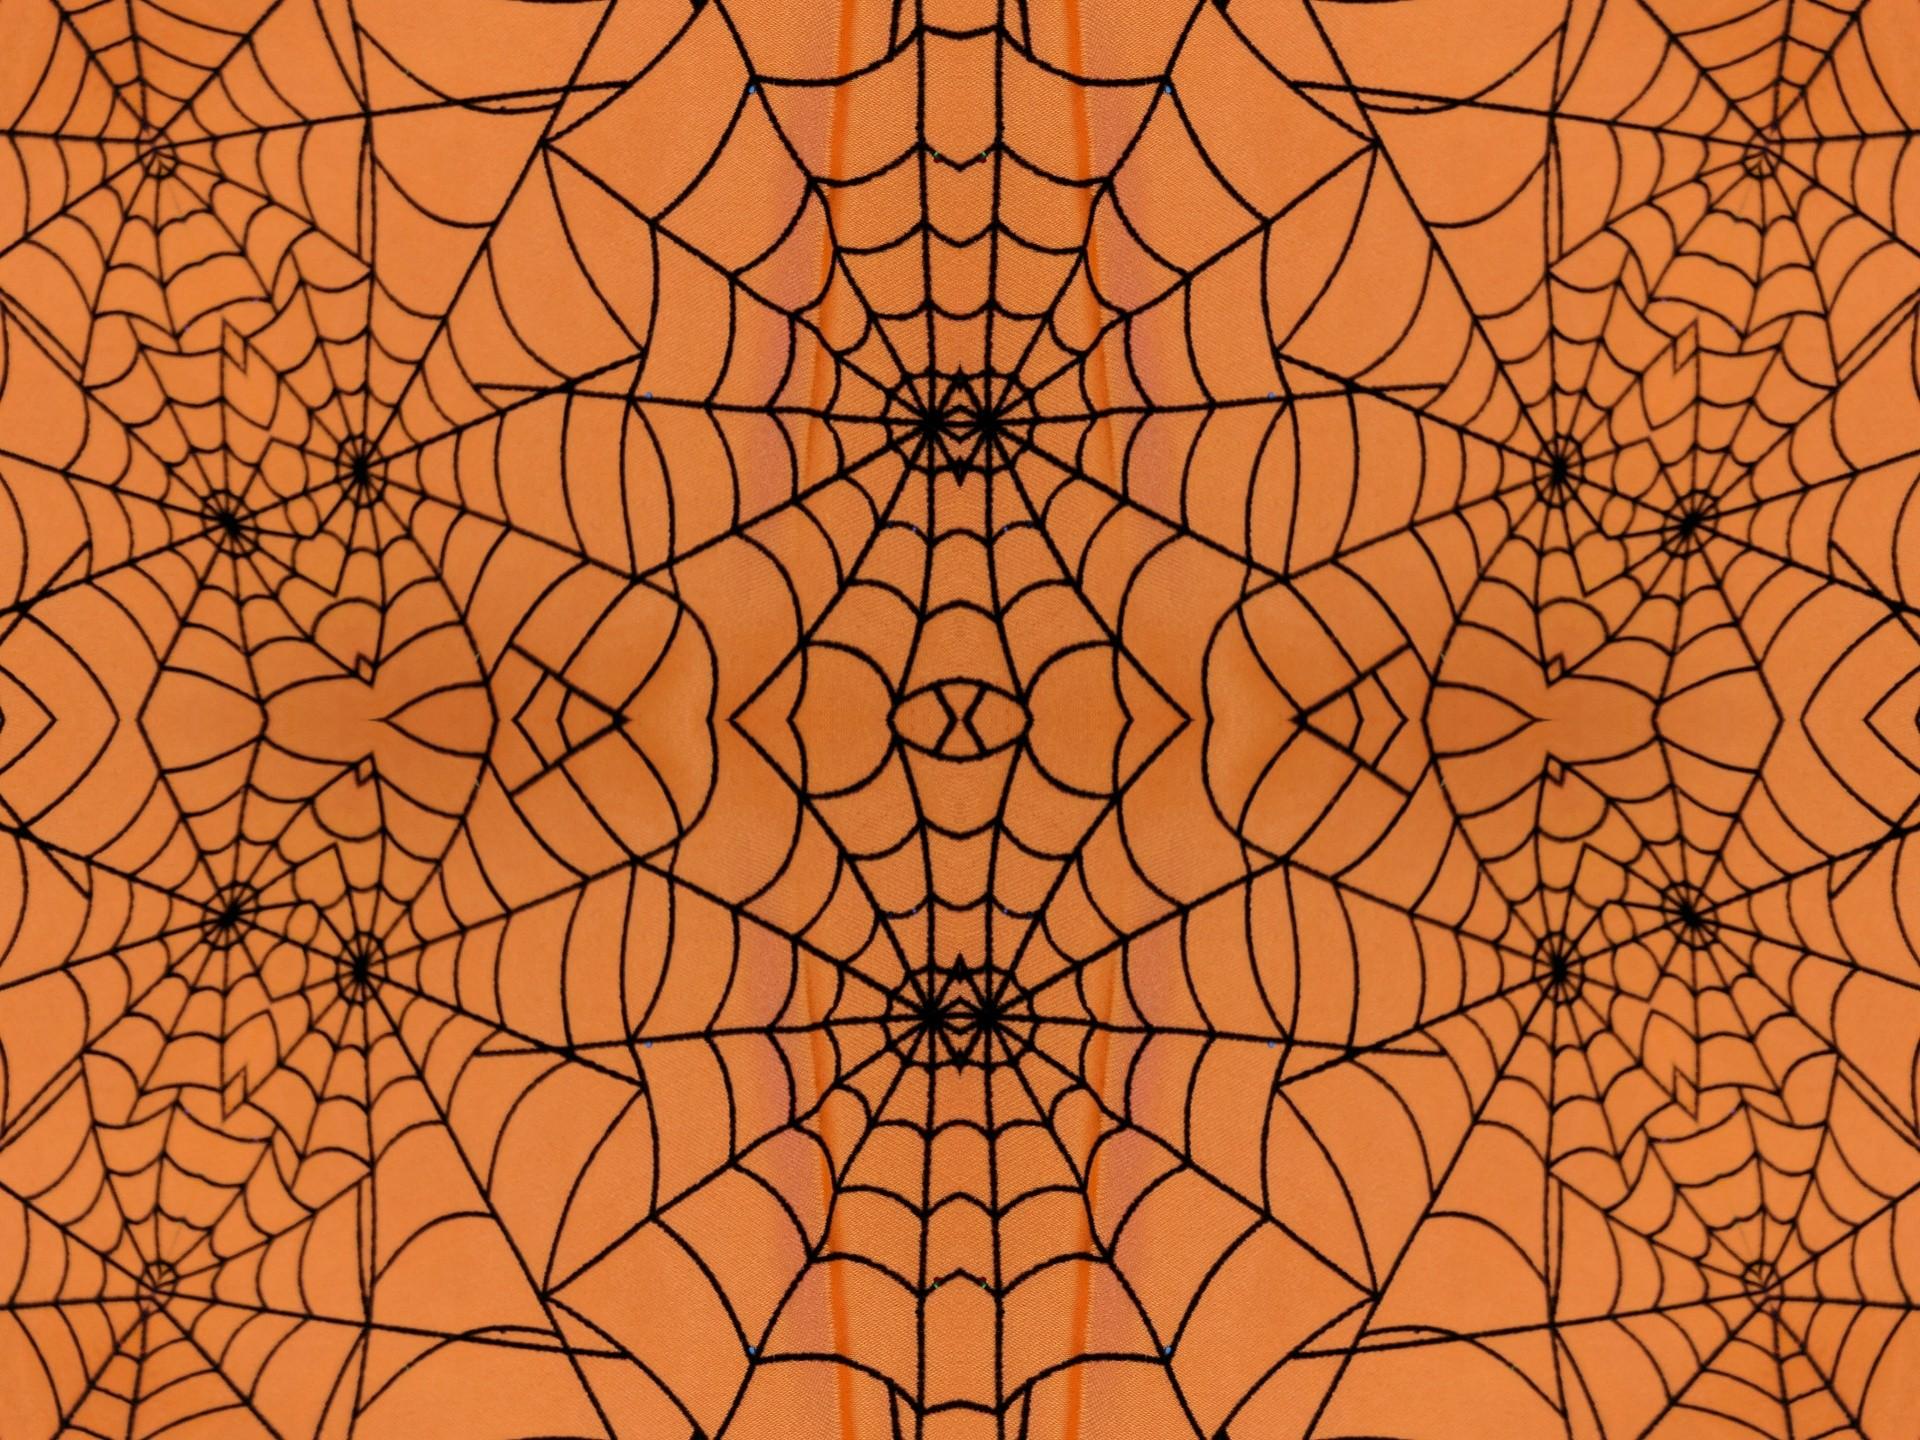 Download Wallpaper Halloween Spider - 955131-spider-web-background-1920x1440-ipad-retina  HD_55312.jpg